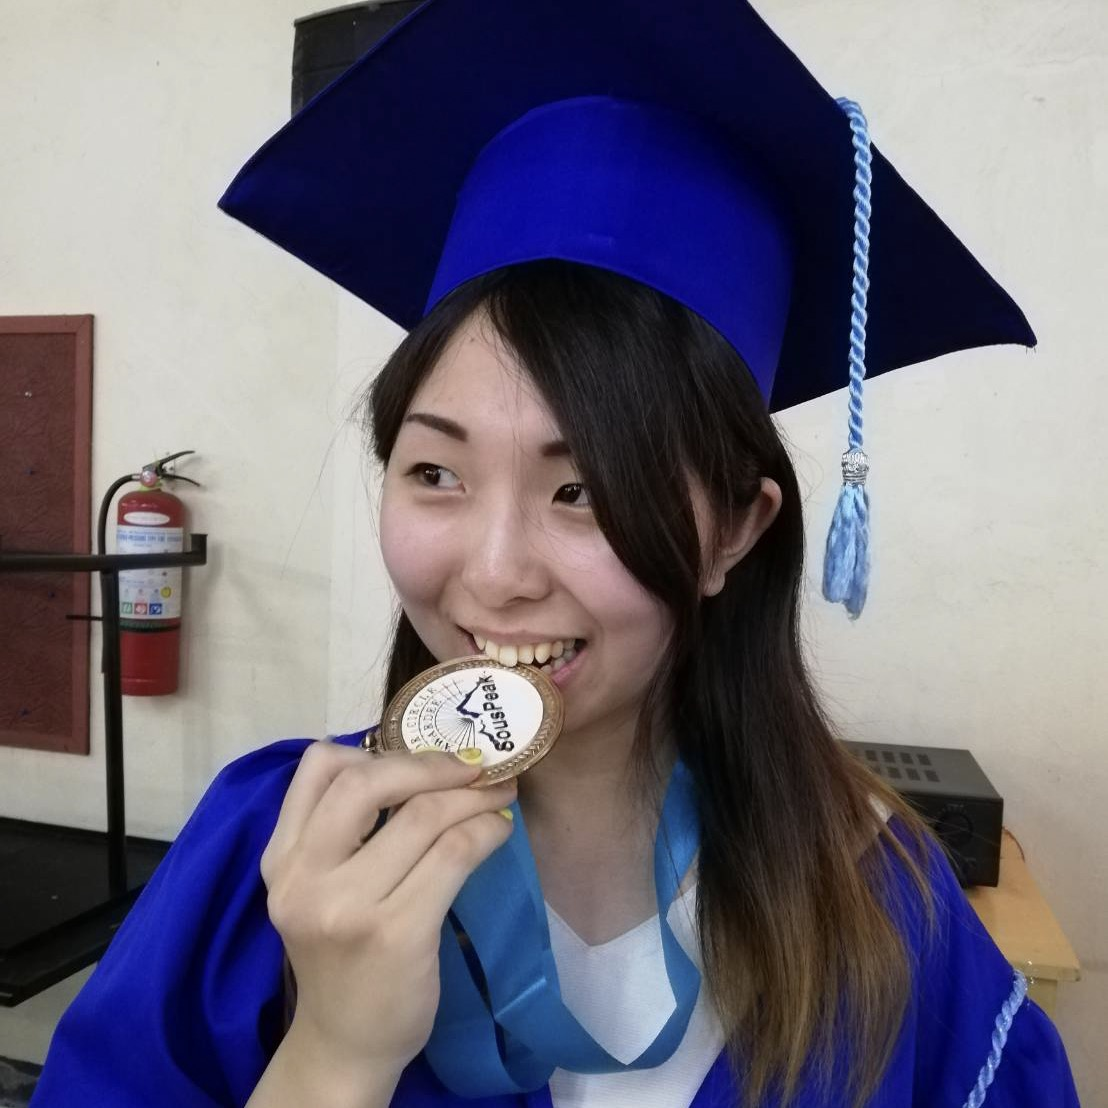 Nagisa Kaneko